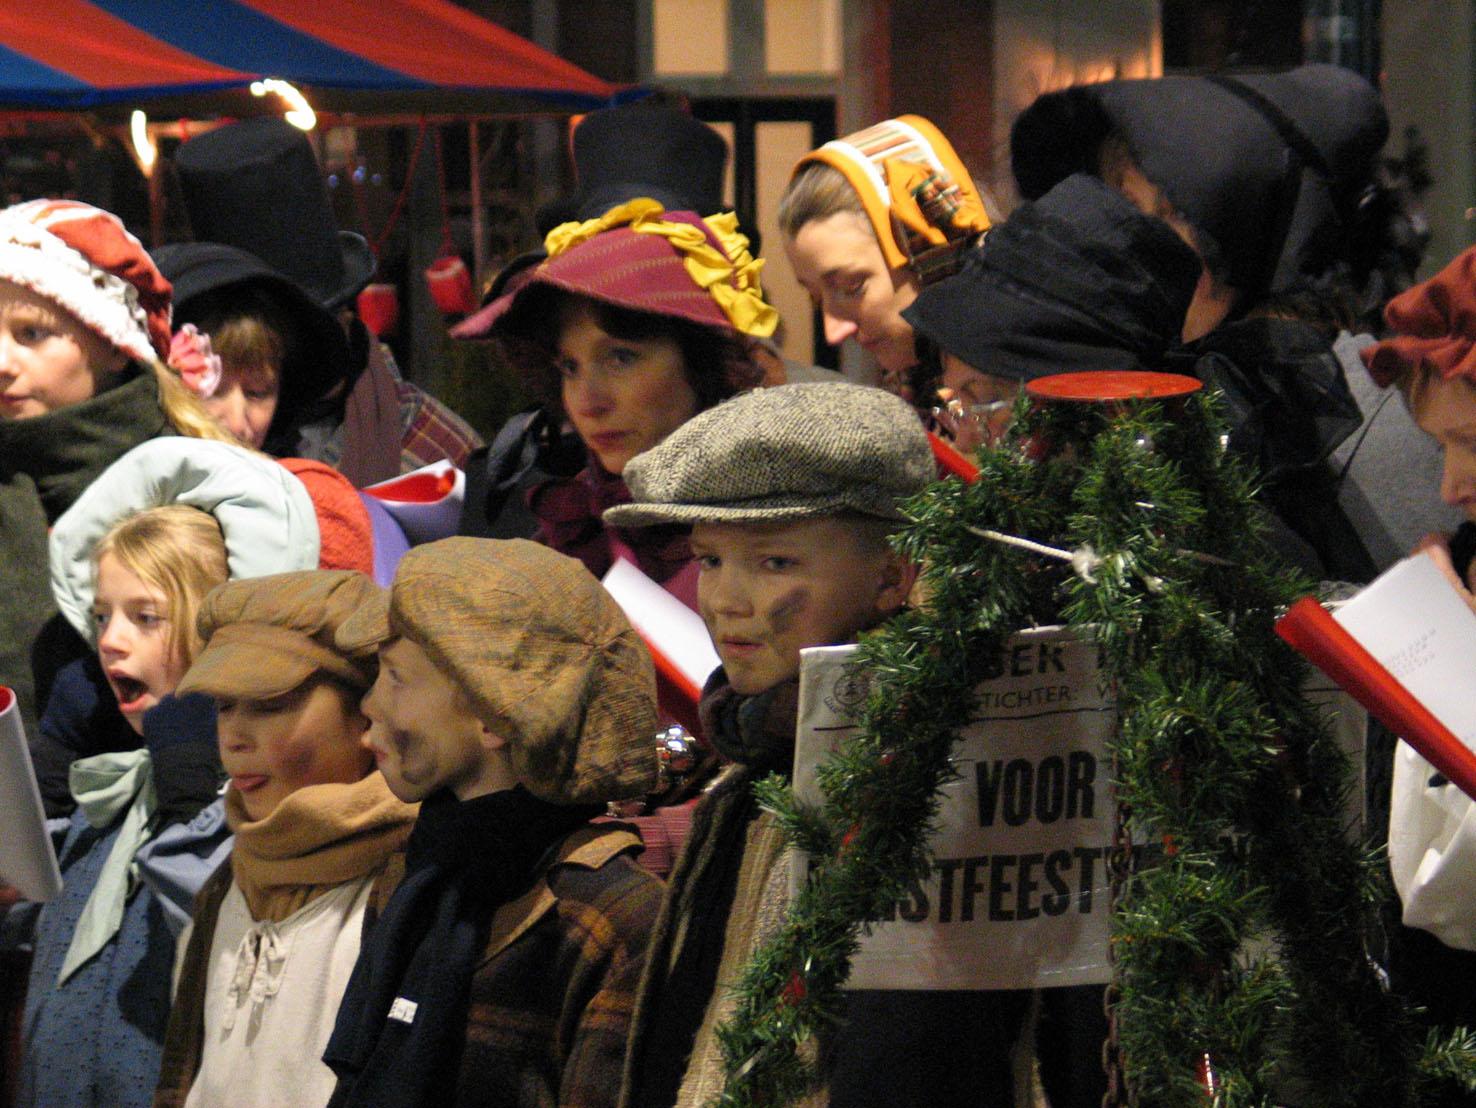 143 - Kerstmarkt Helmond 2003.jpg